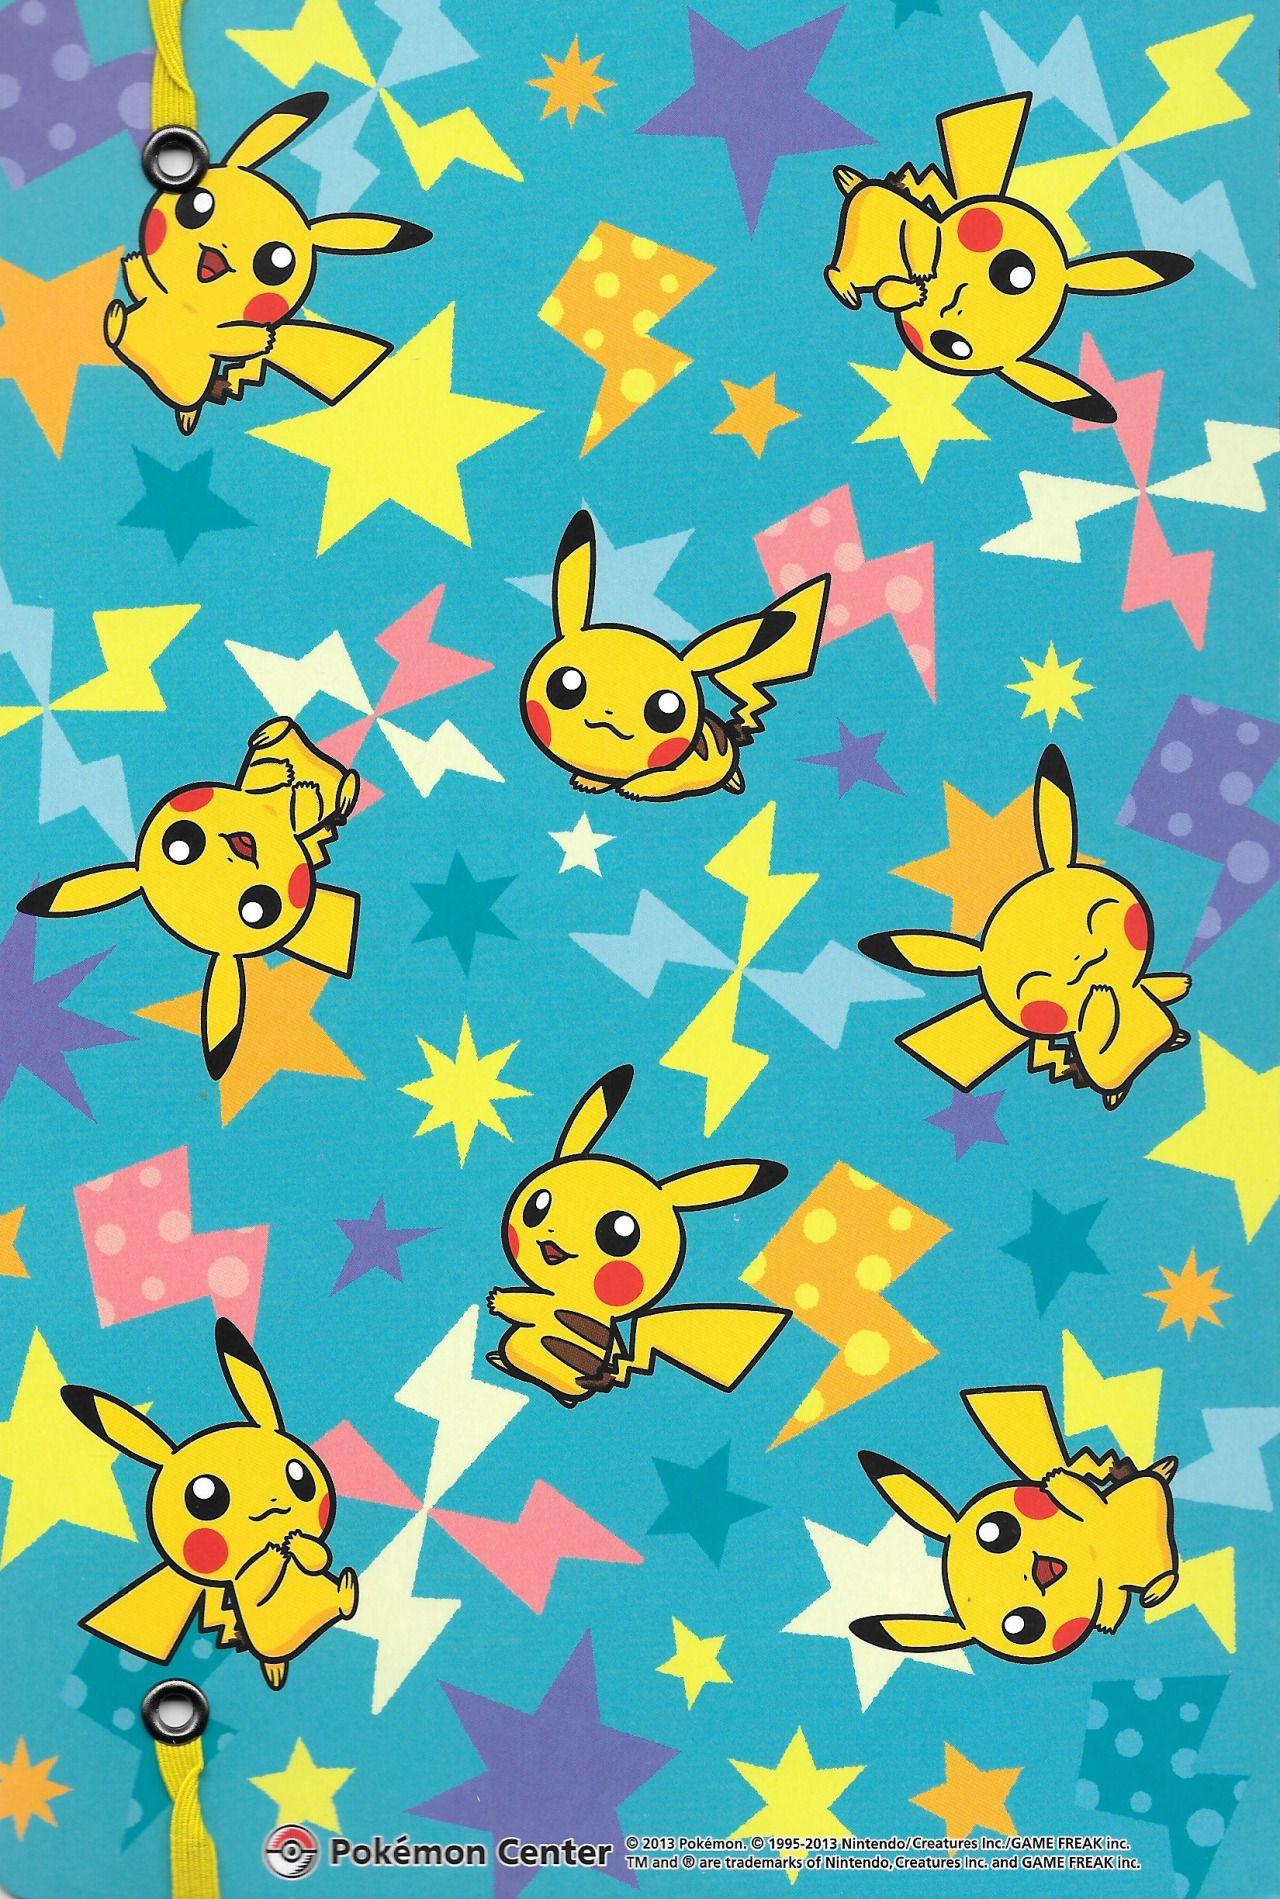 Pikachu Wallpaper Cute Pokemon Wallpaper Pikachu Wallpaper